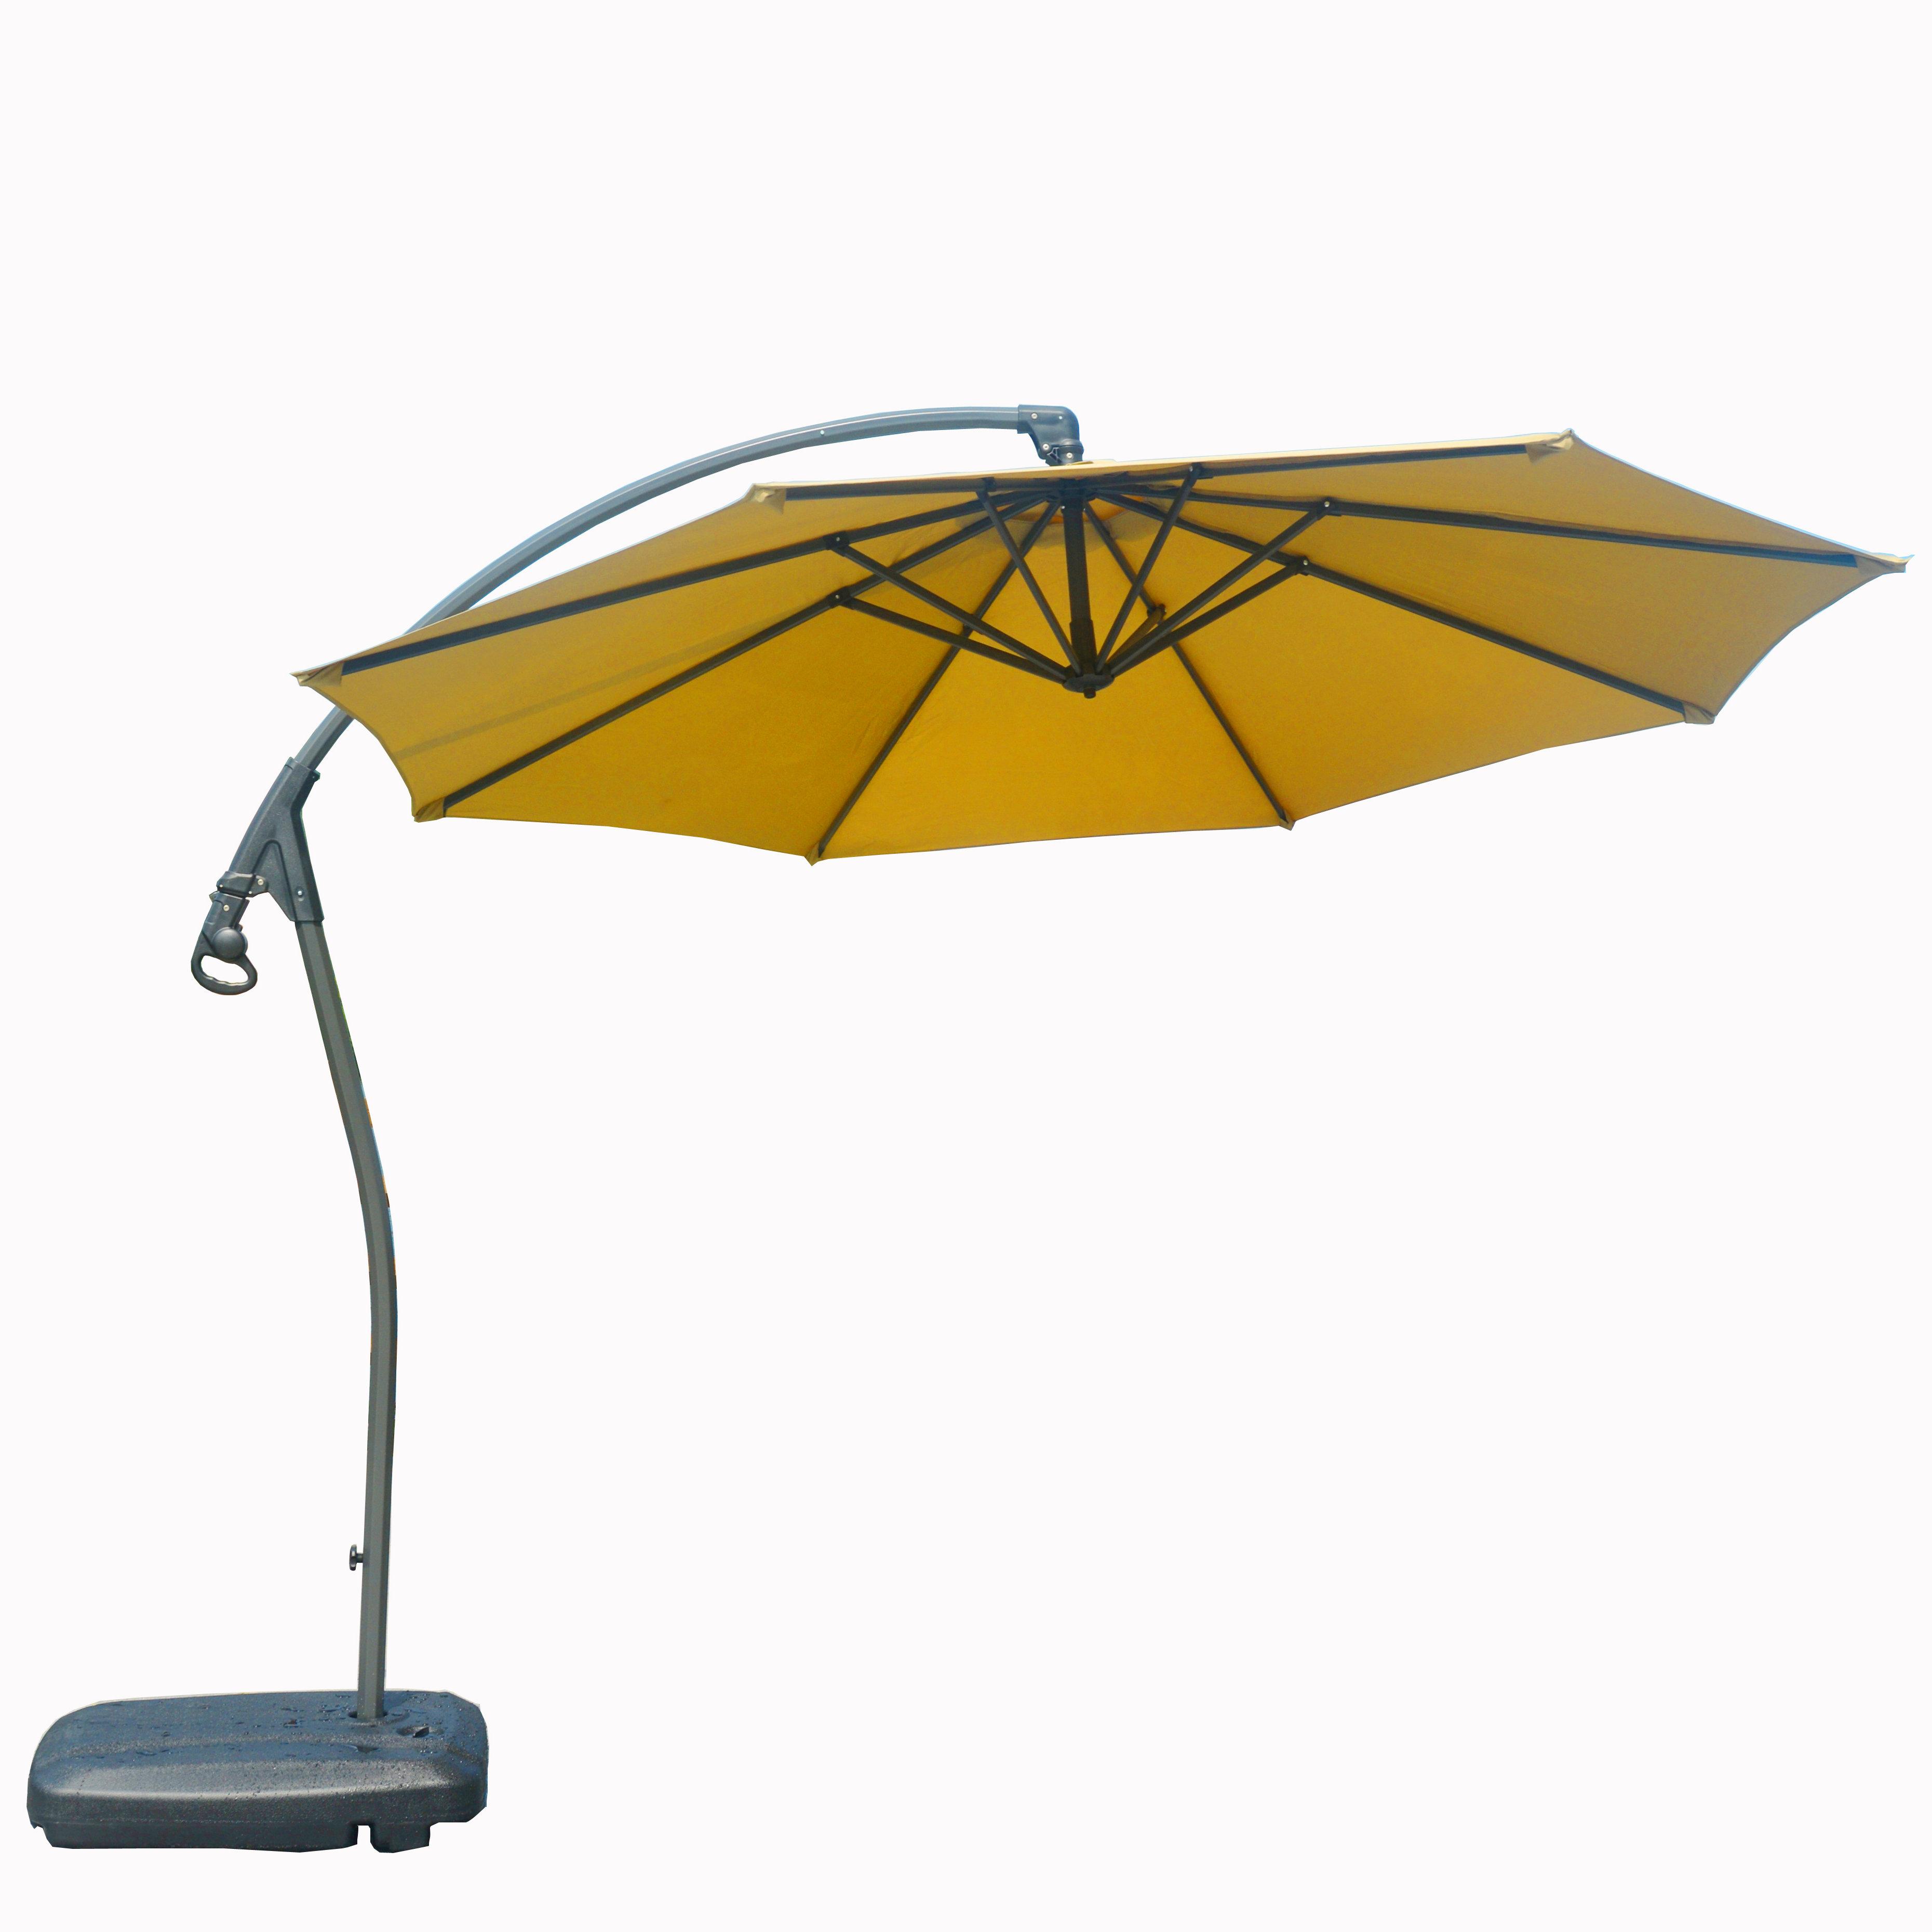 Latest Cockermouth Rotating Cantilever Umbrellas For Hemmer 10' Cantilever Umbrella (View 5 of 20)